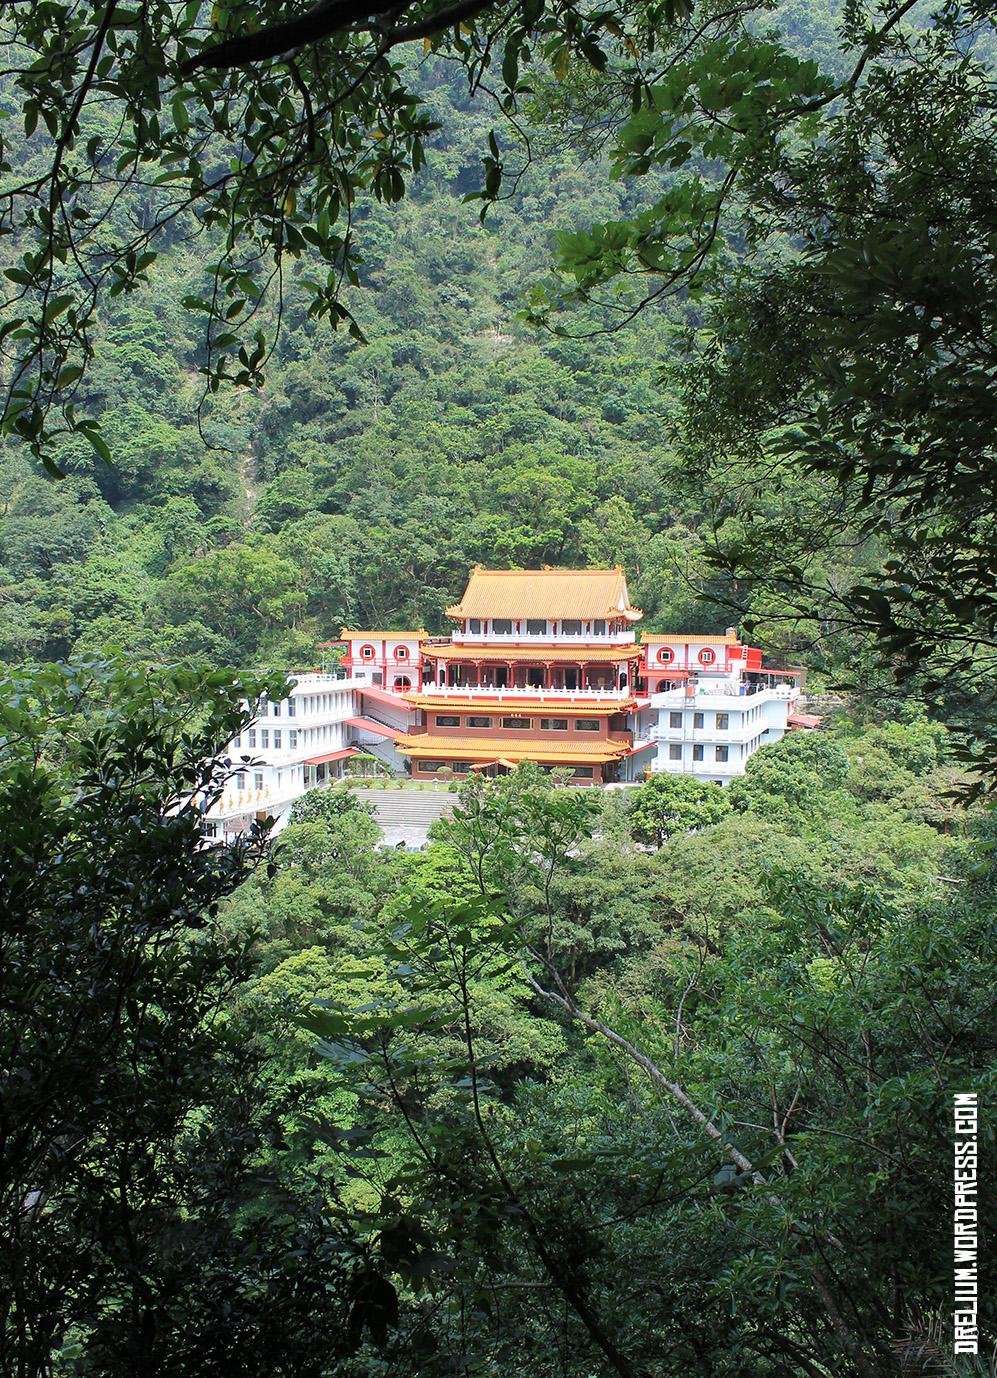 ChangChun Temple - Taroko Gorge - Hualien County - Taiwan